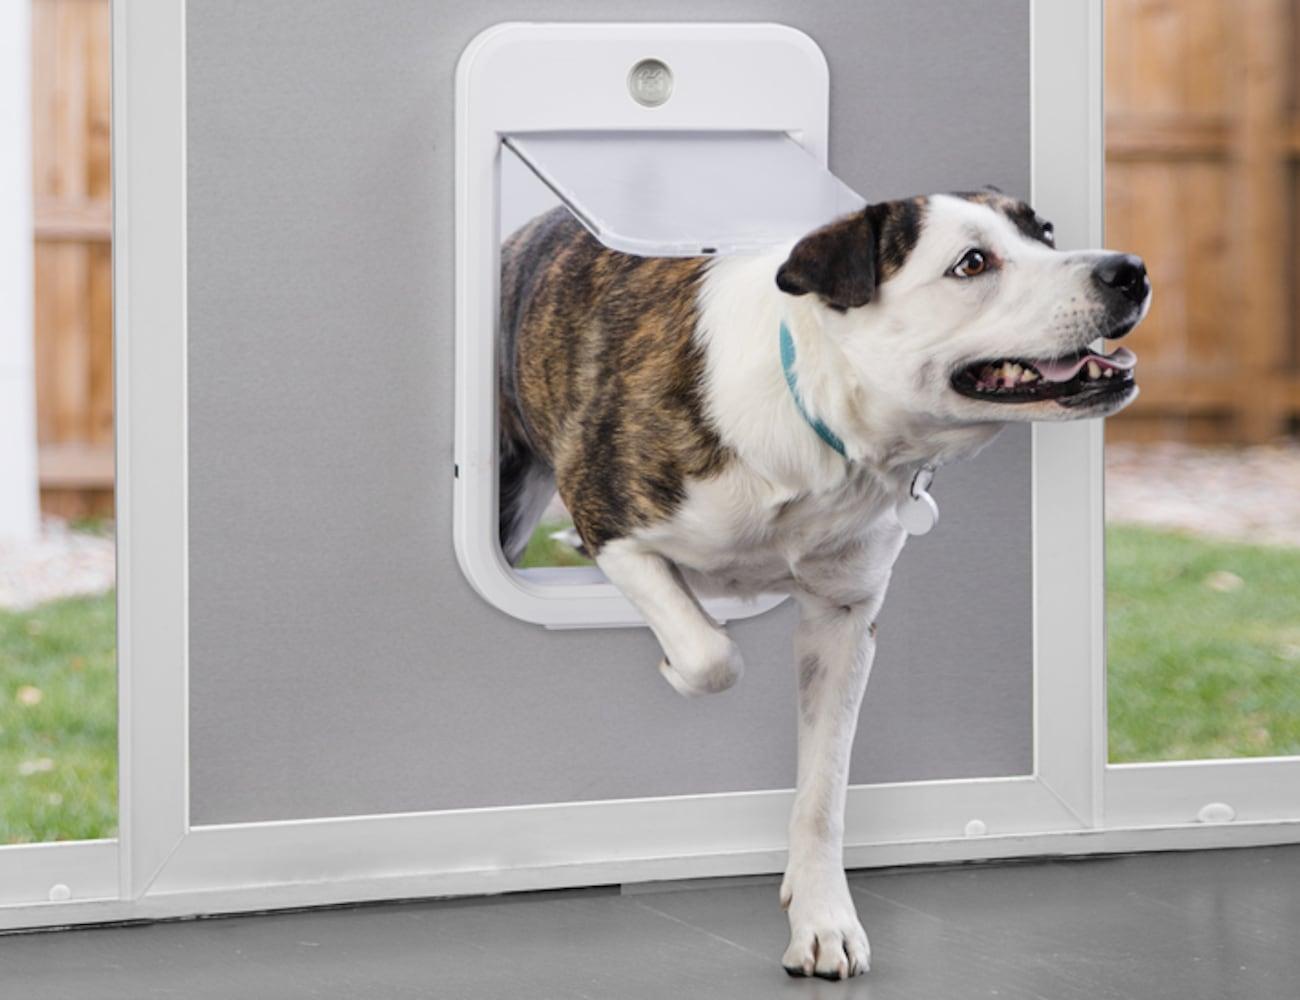 Wagz Go Smart Automatic Dog Door